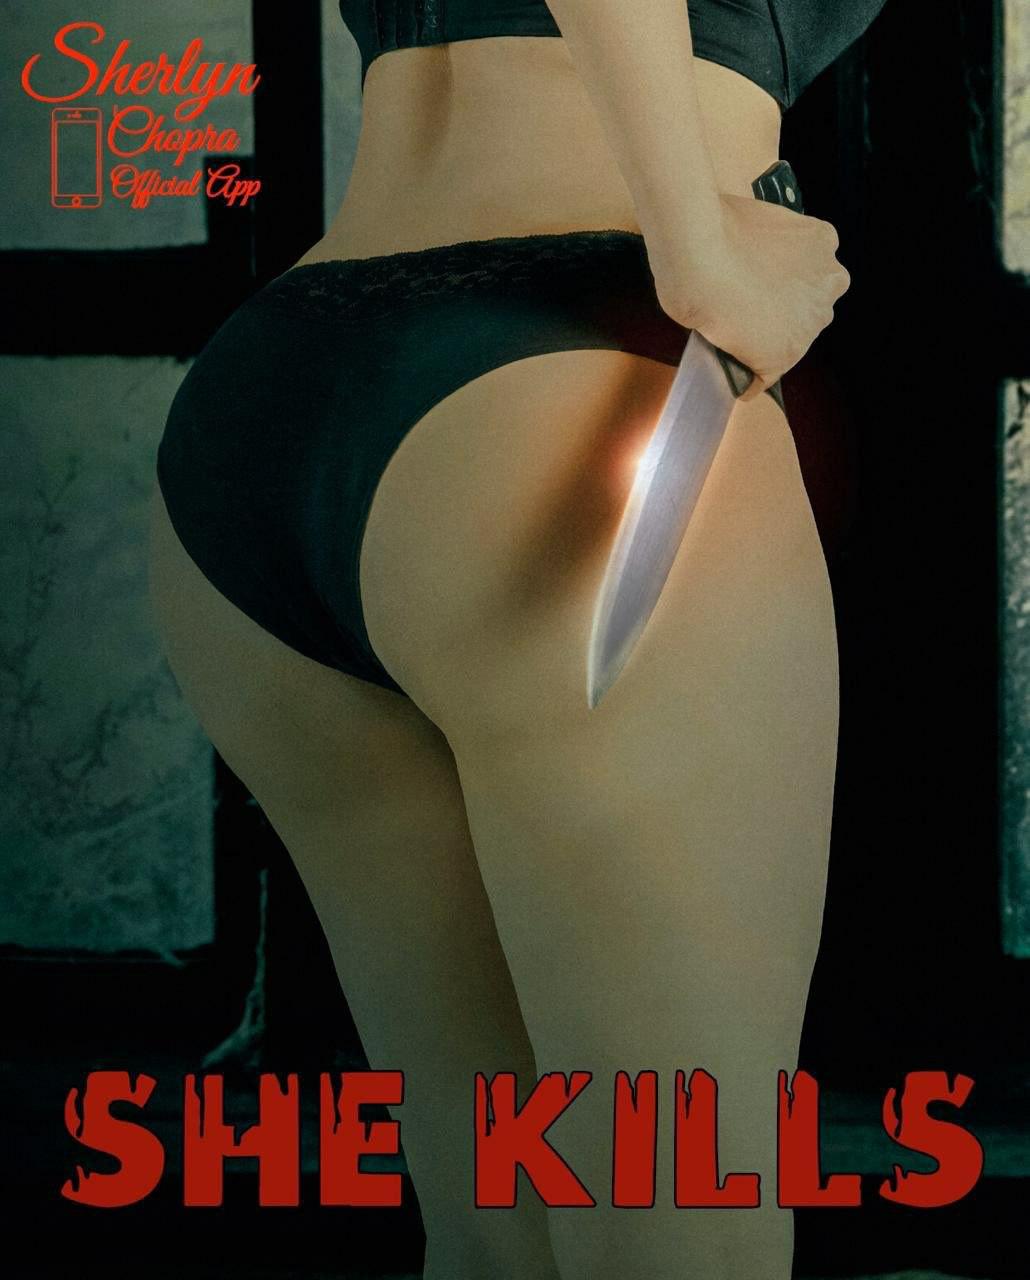 She Kills (2019) UNRATED 720p Sherlyn Chopra Hindi Short Film x265 AAC [150MB]